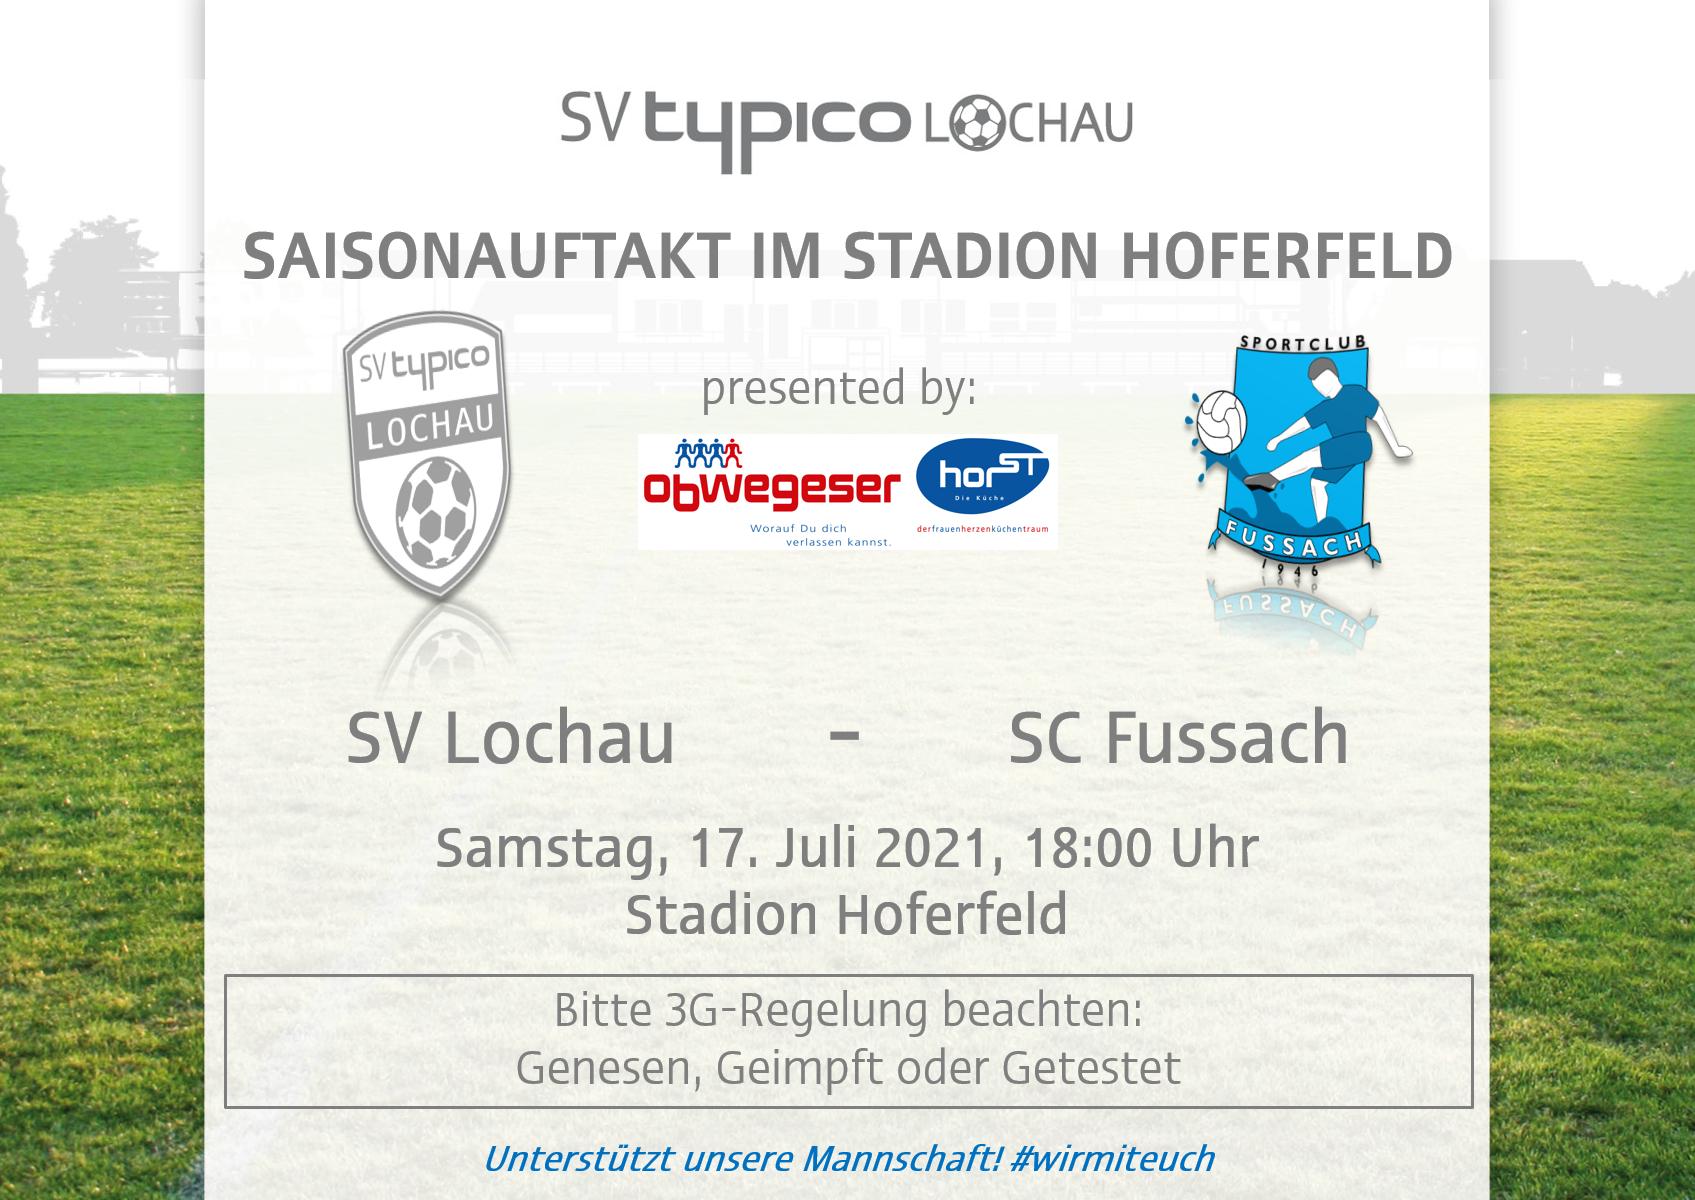 Saisonauftakt im Stadion Hoferfeld